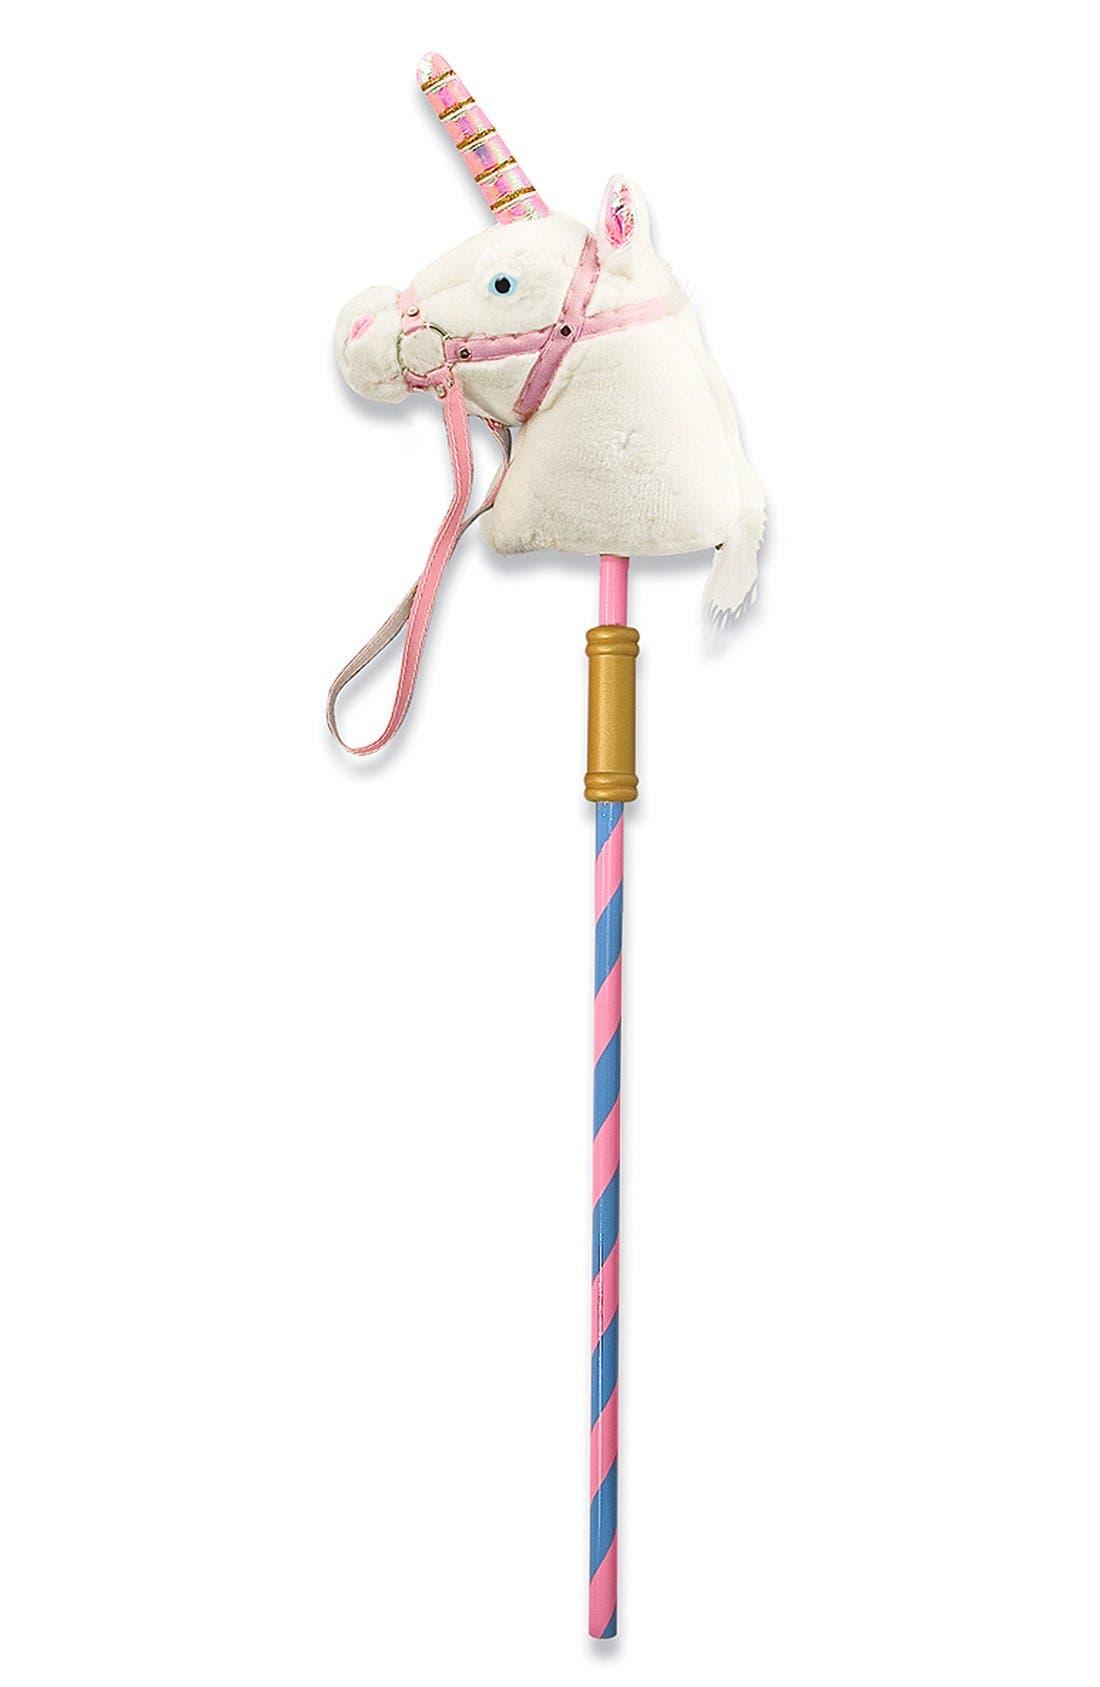 'Prance-n-Play' Stick Unicorn,                         Main,                         color, Pink